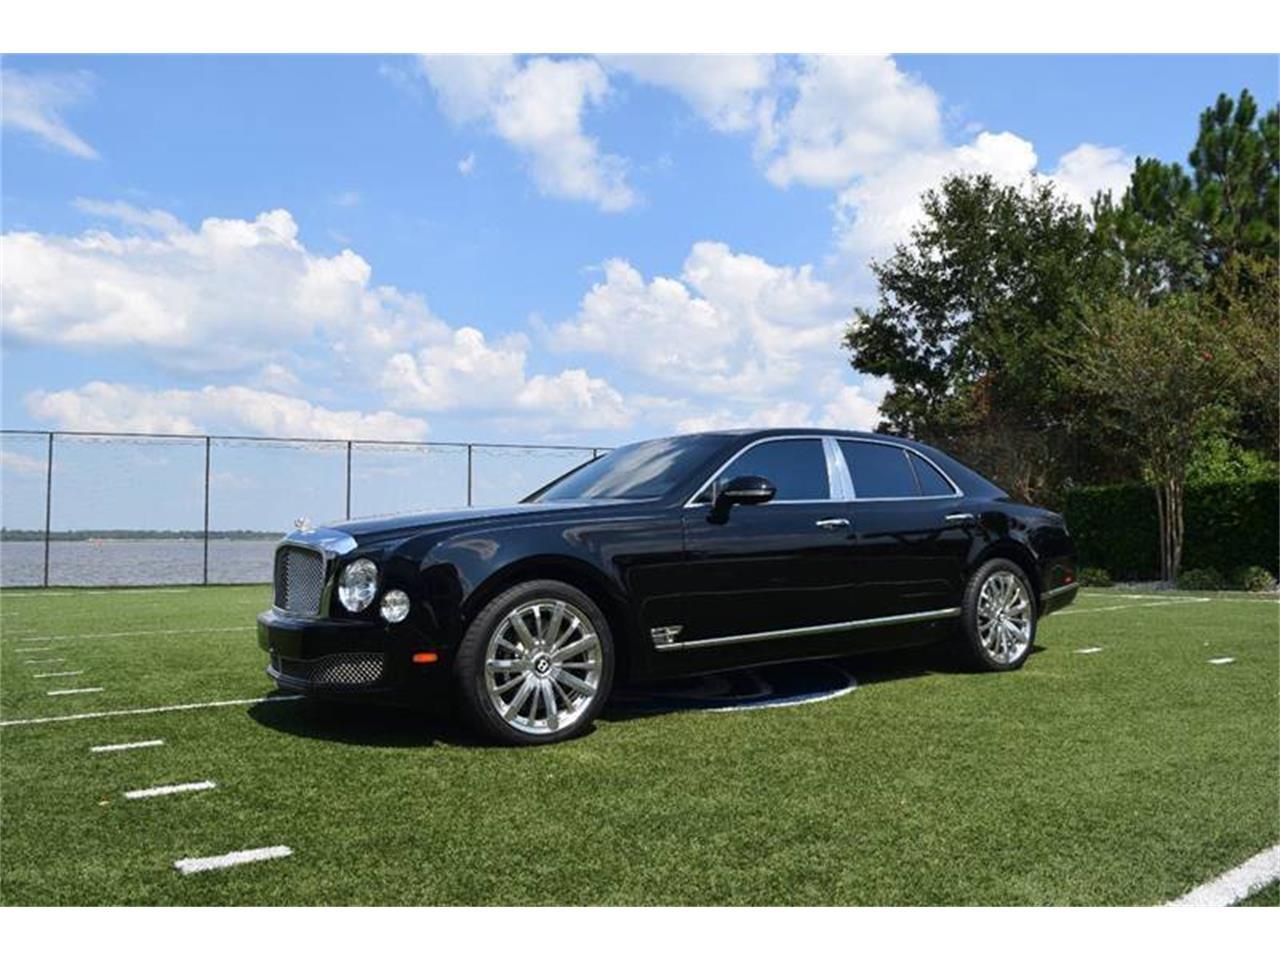 2016 Bentley Mulsanne S (CC-1257921) for sale in Biloxi, Mississippi